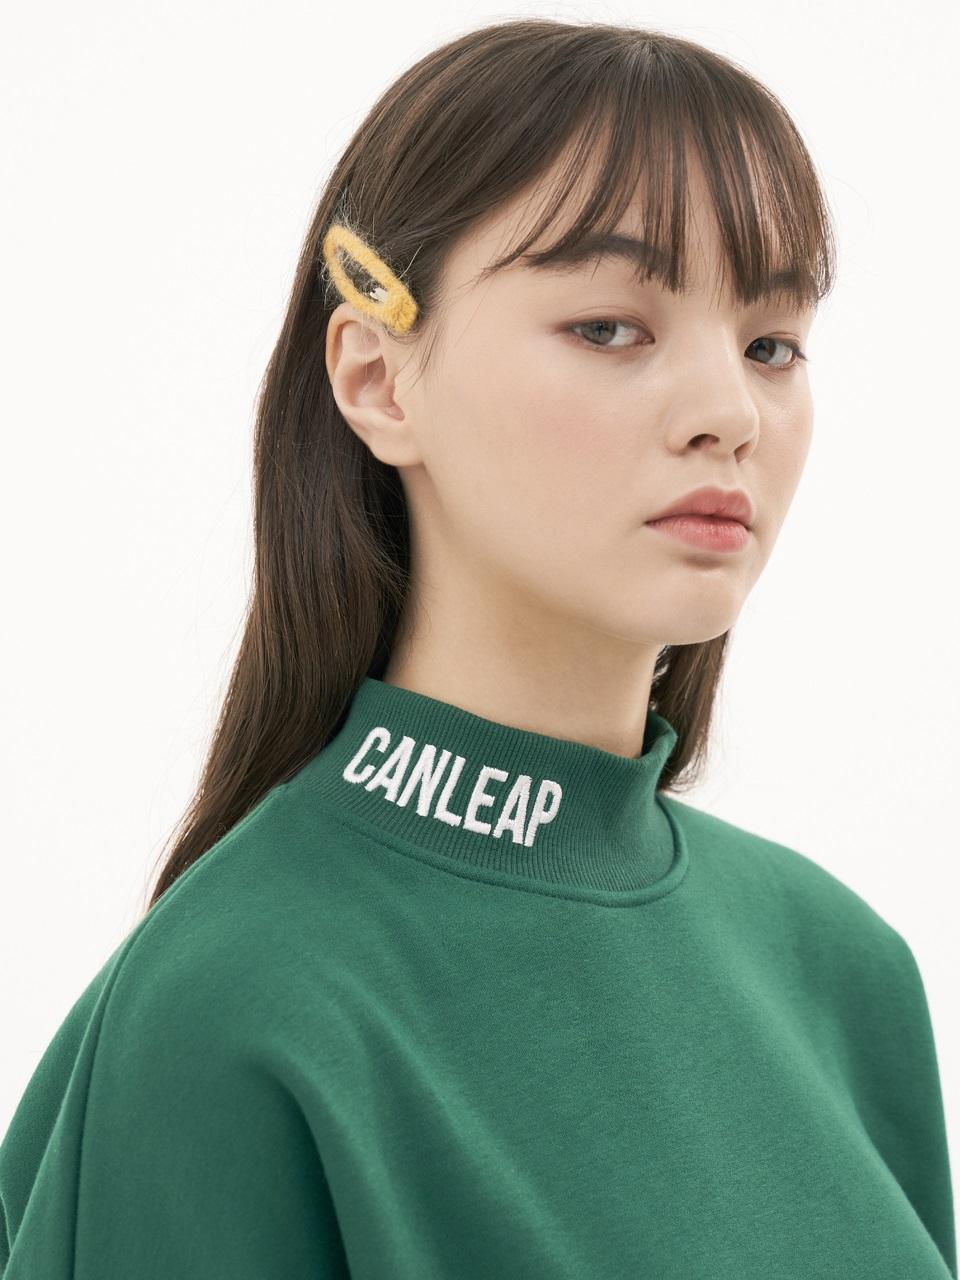 CANLEAP国际品牌品牌2020春夏宽松落肩LOGO字母刺绣高领女士拉绒卫衣_绿色